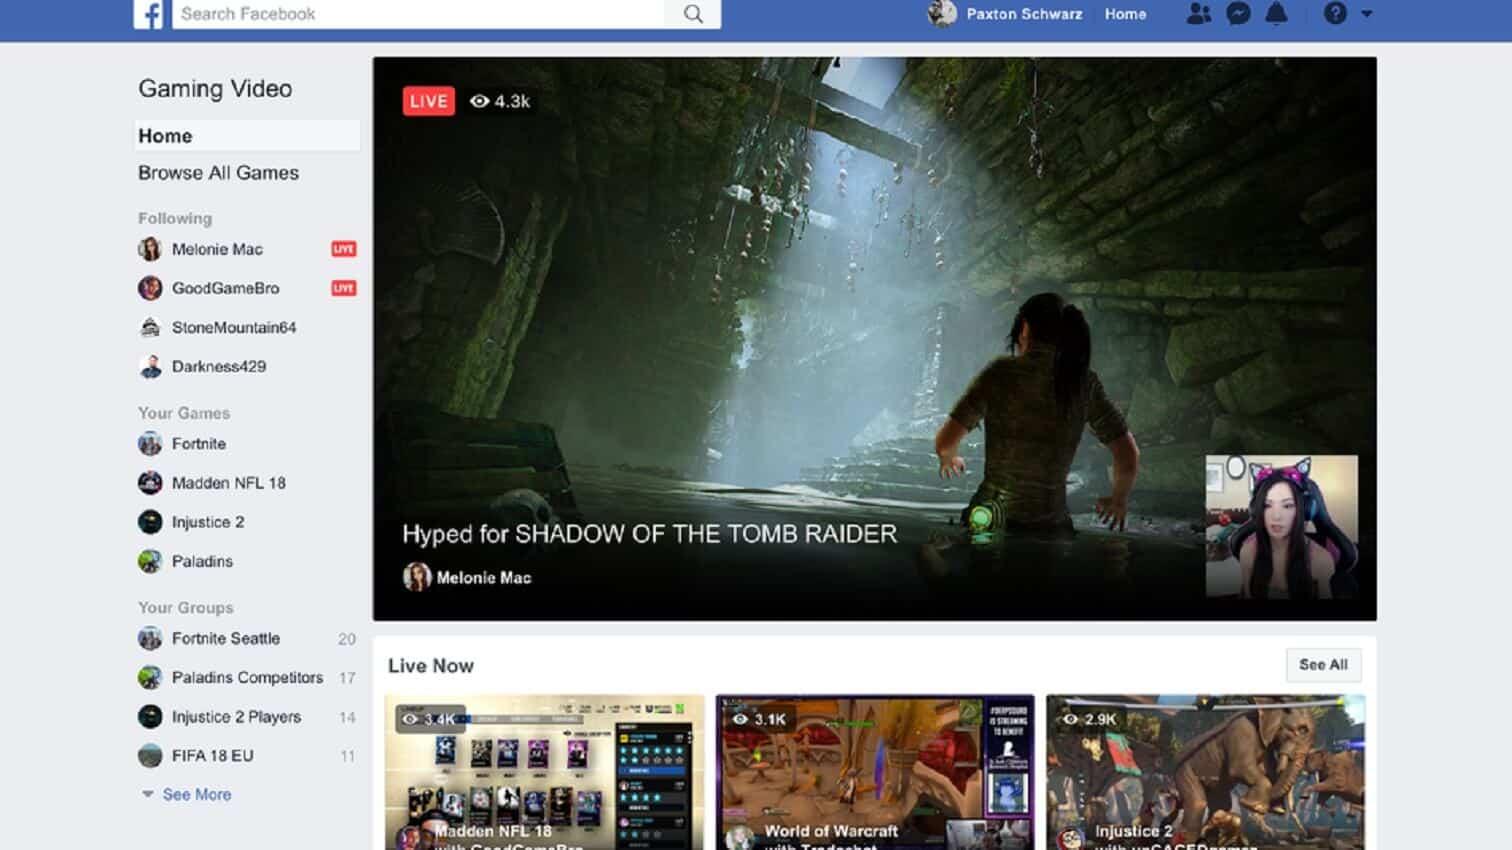 fb.gg streaming platform